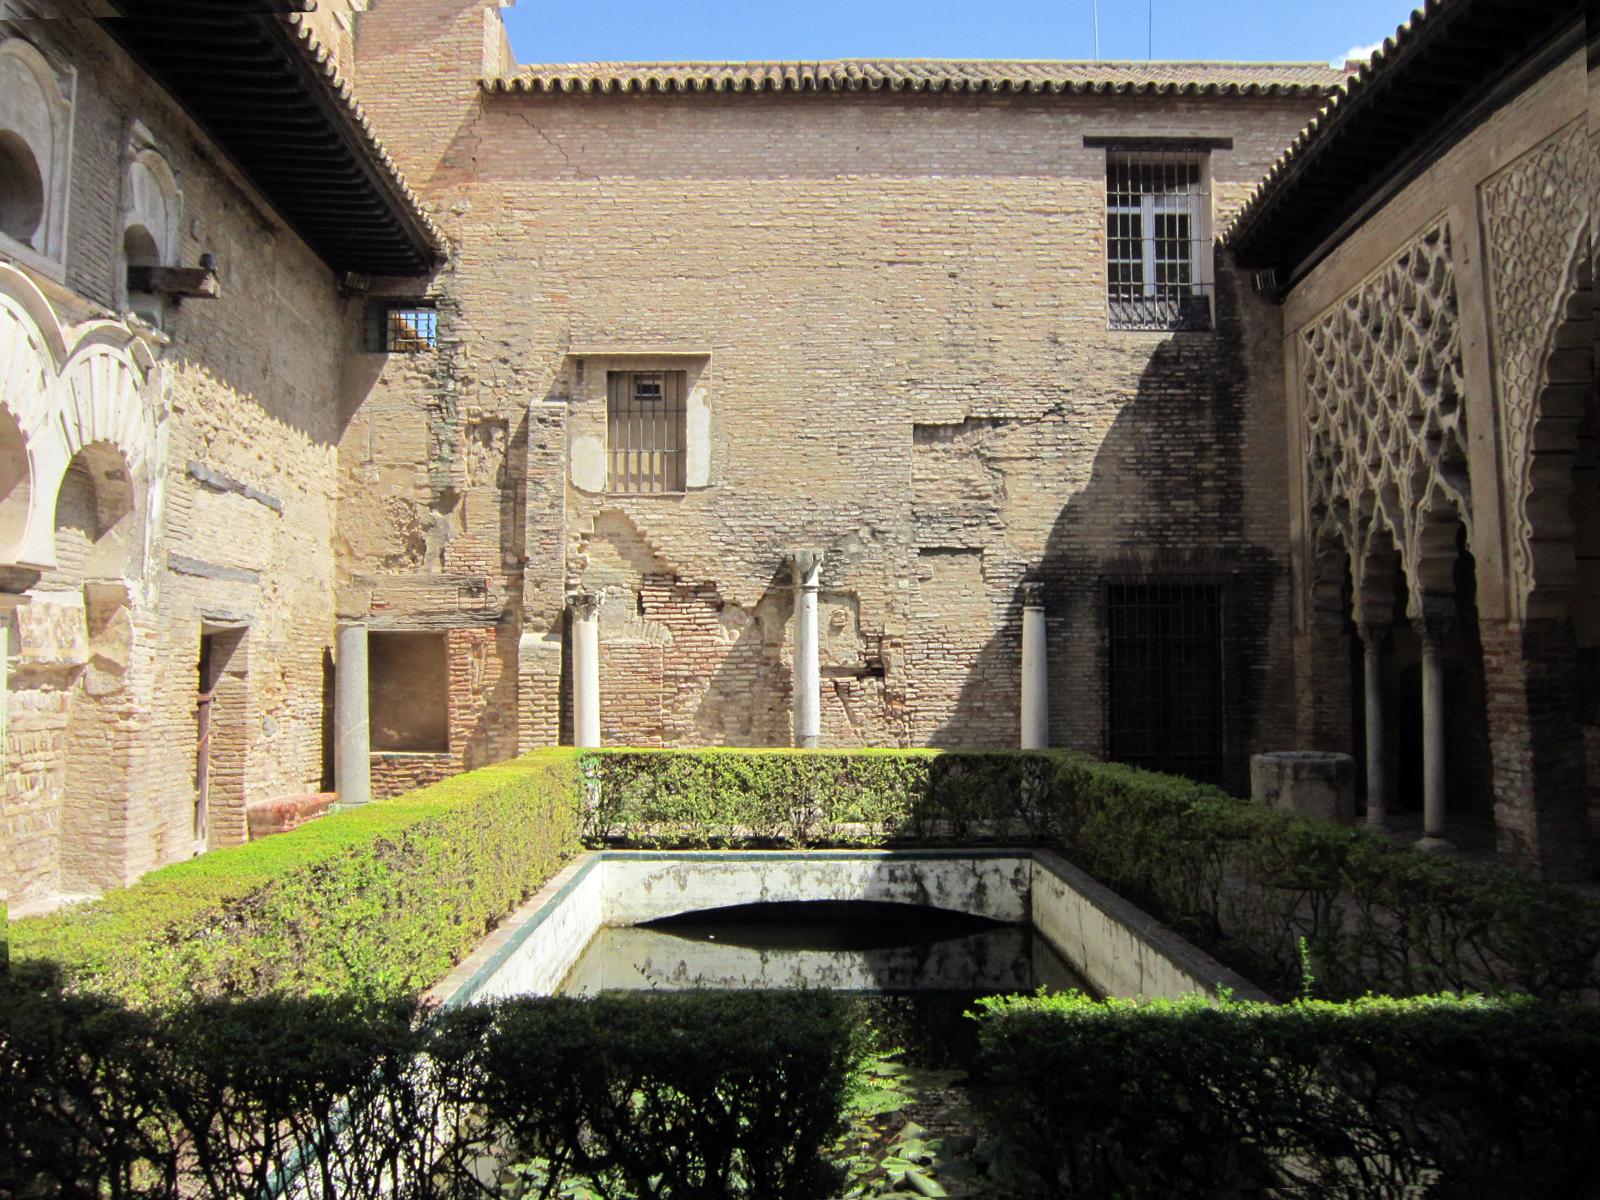 Patio de Yeso alcazar, sevilla에 대한 이미지 검색결과